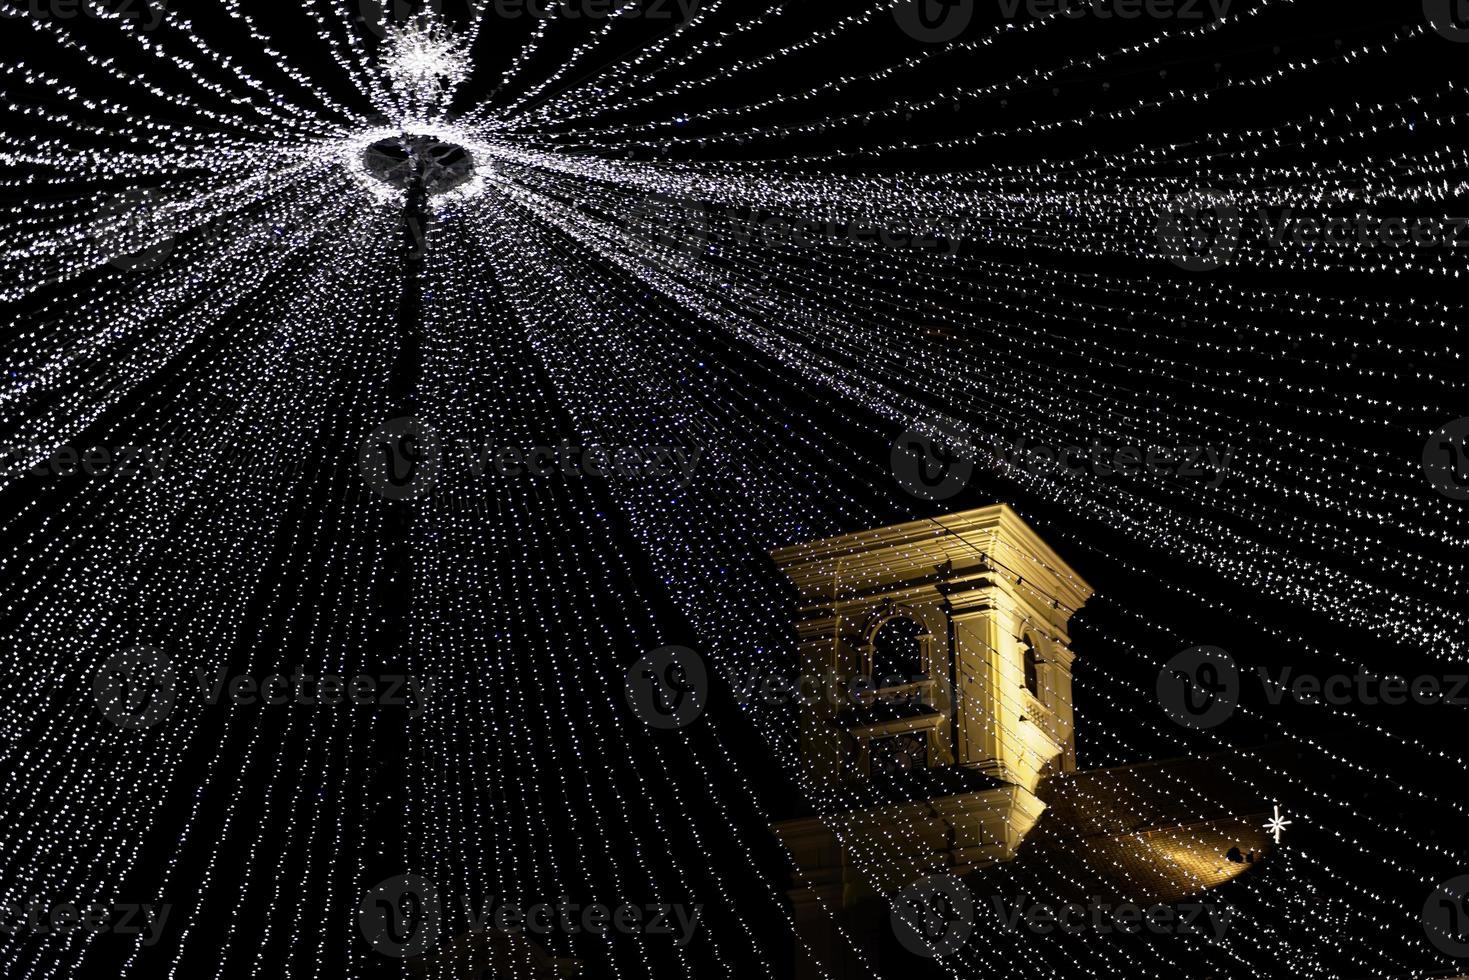 Christmas lights and historical tower photo